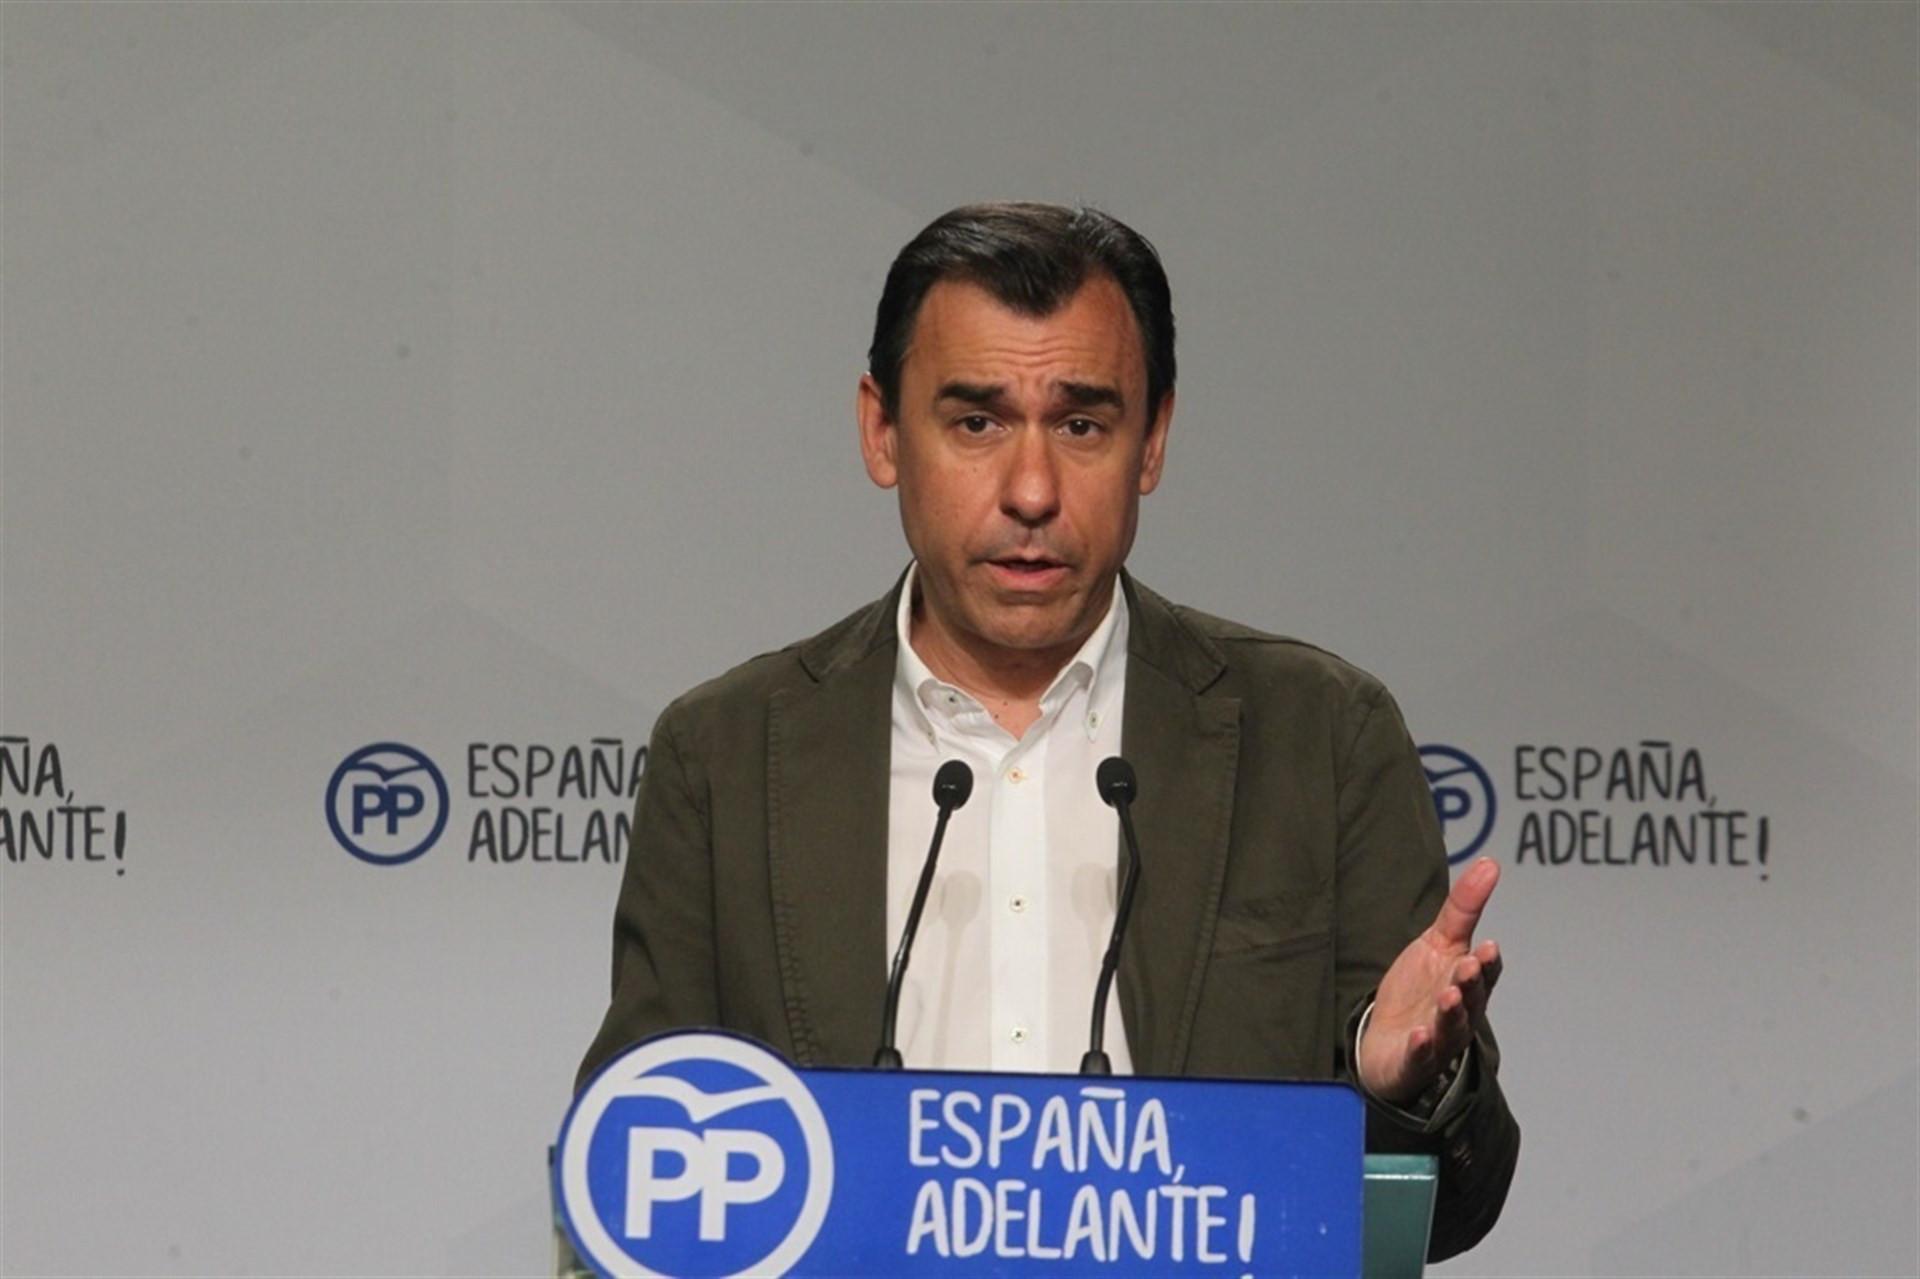 Fernando Martinez Maillo